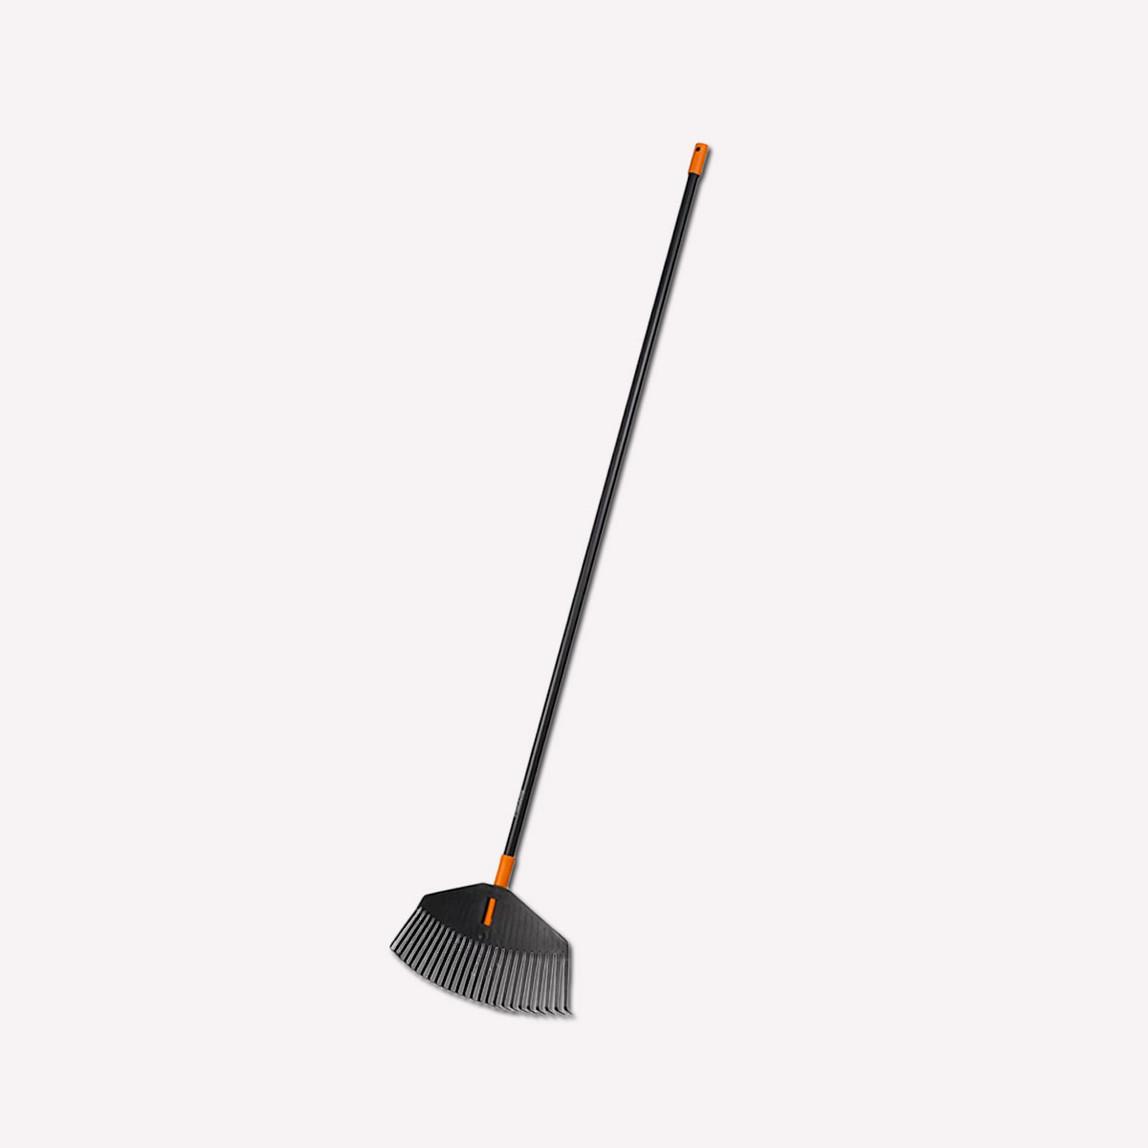 Fiskars 135026 Solid Medium Size Yaprak Süpürgesi